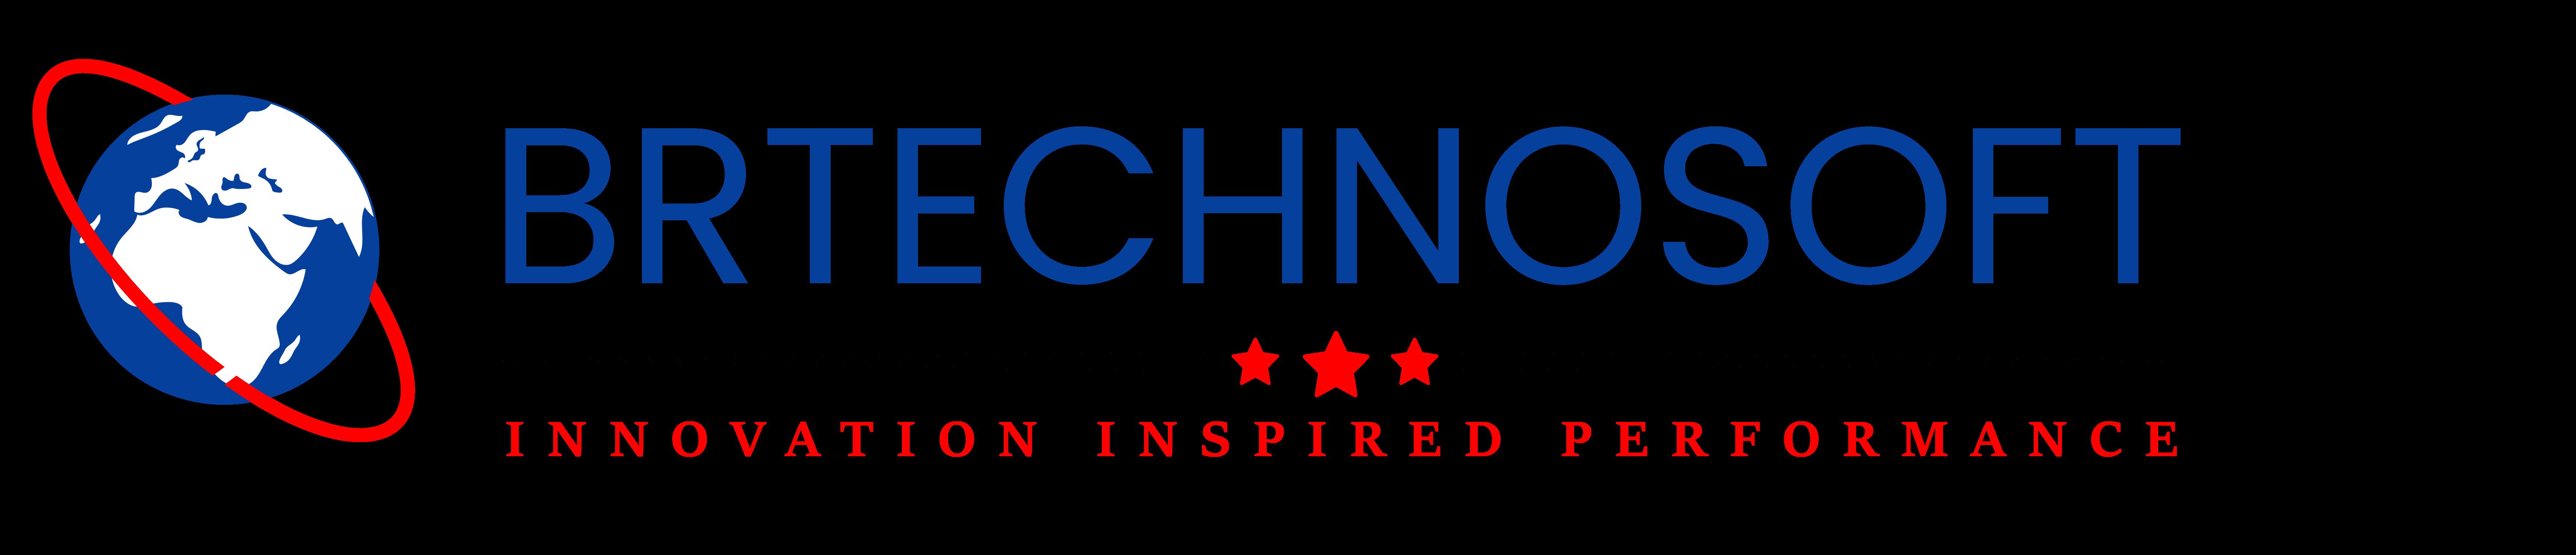 brtechnooft technologies llc